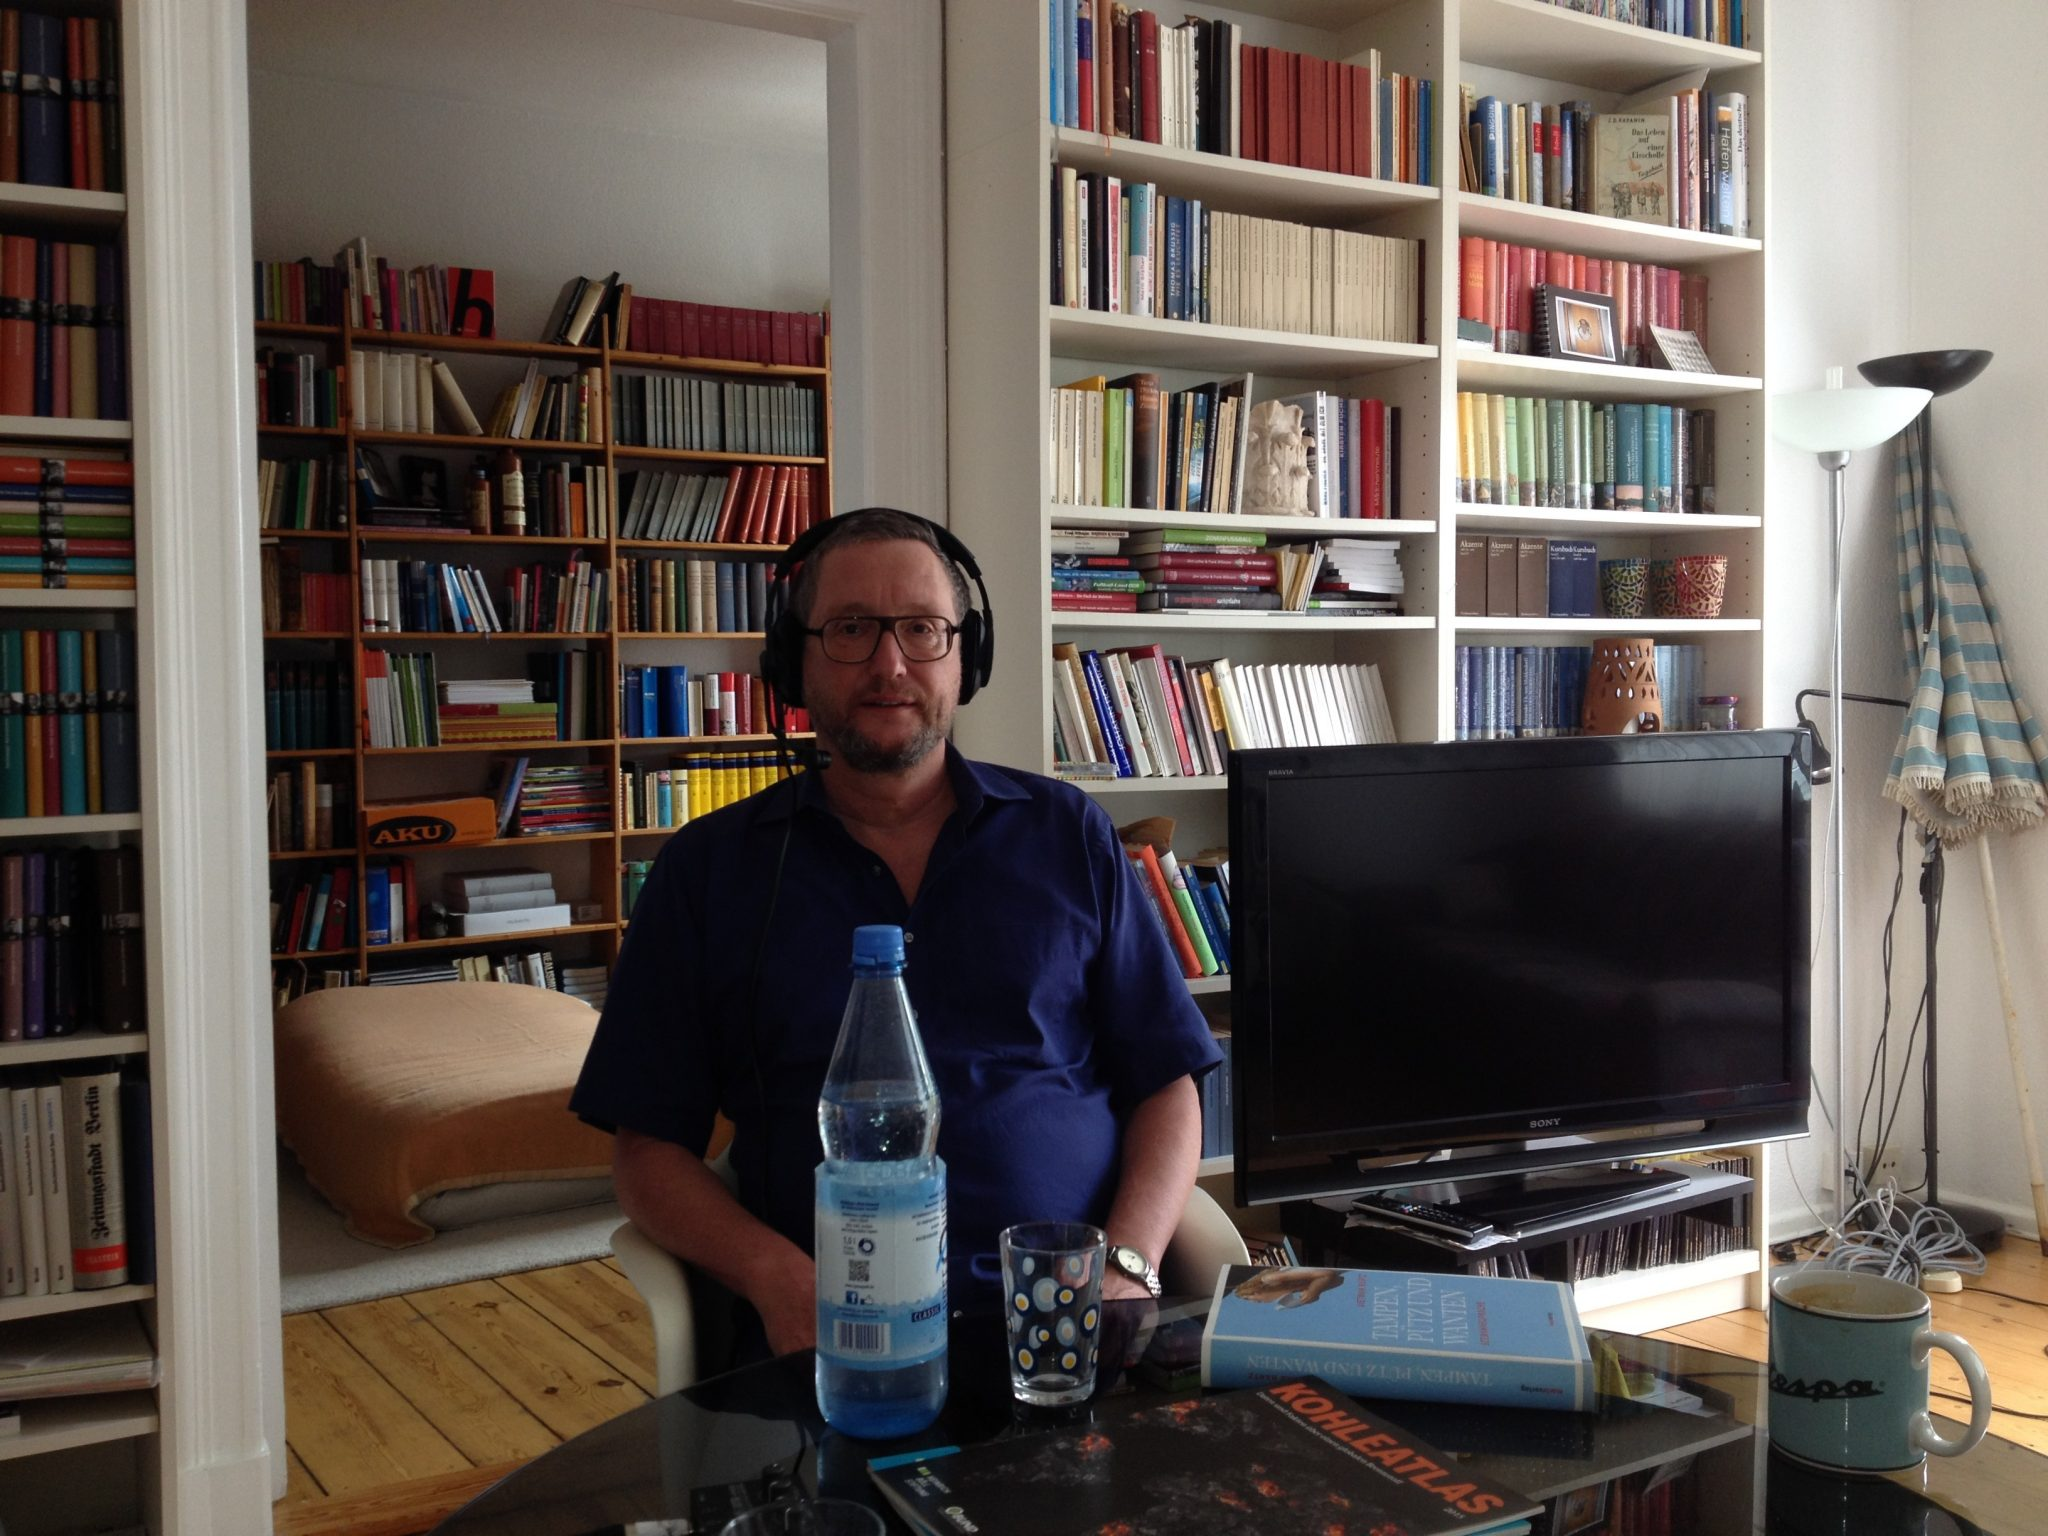 Dietmar Bartz